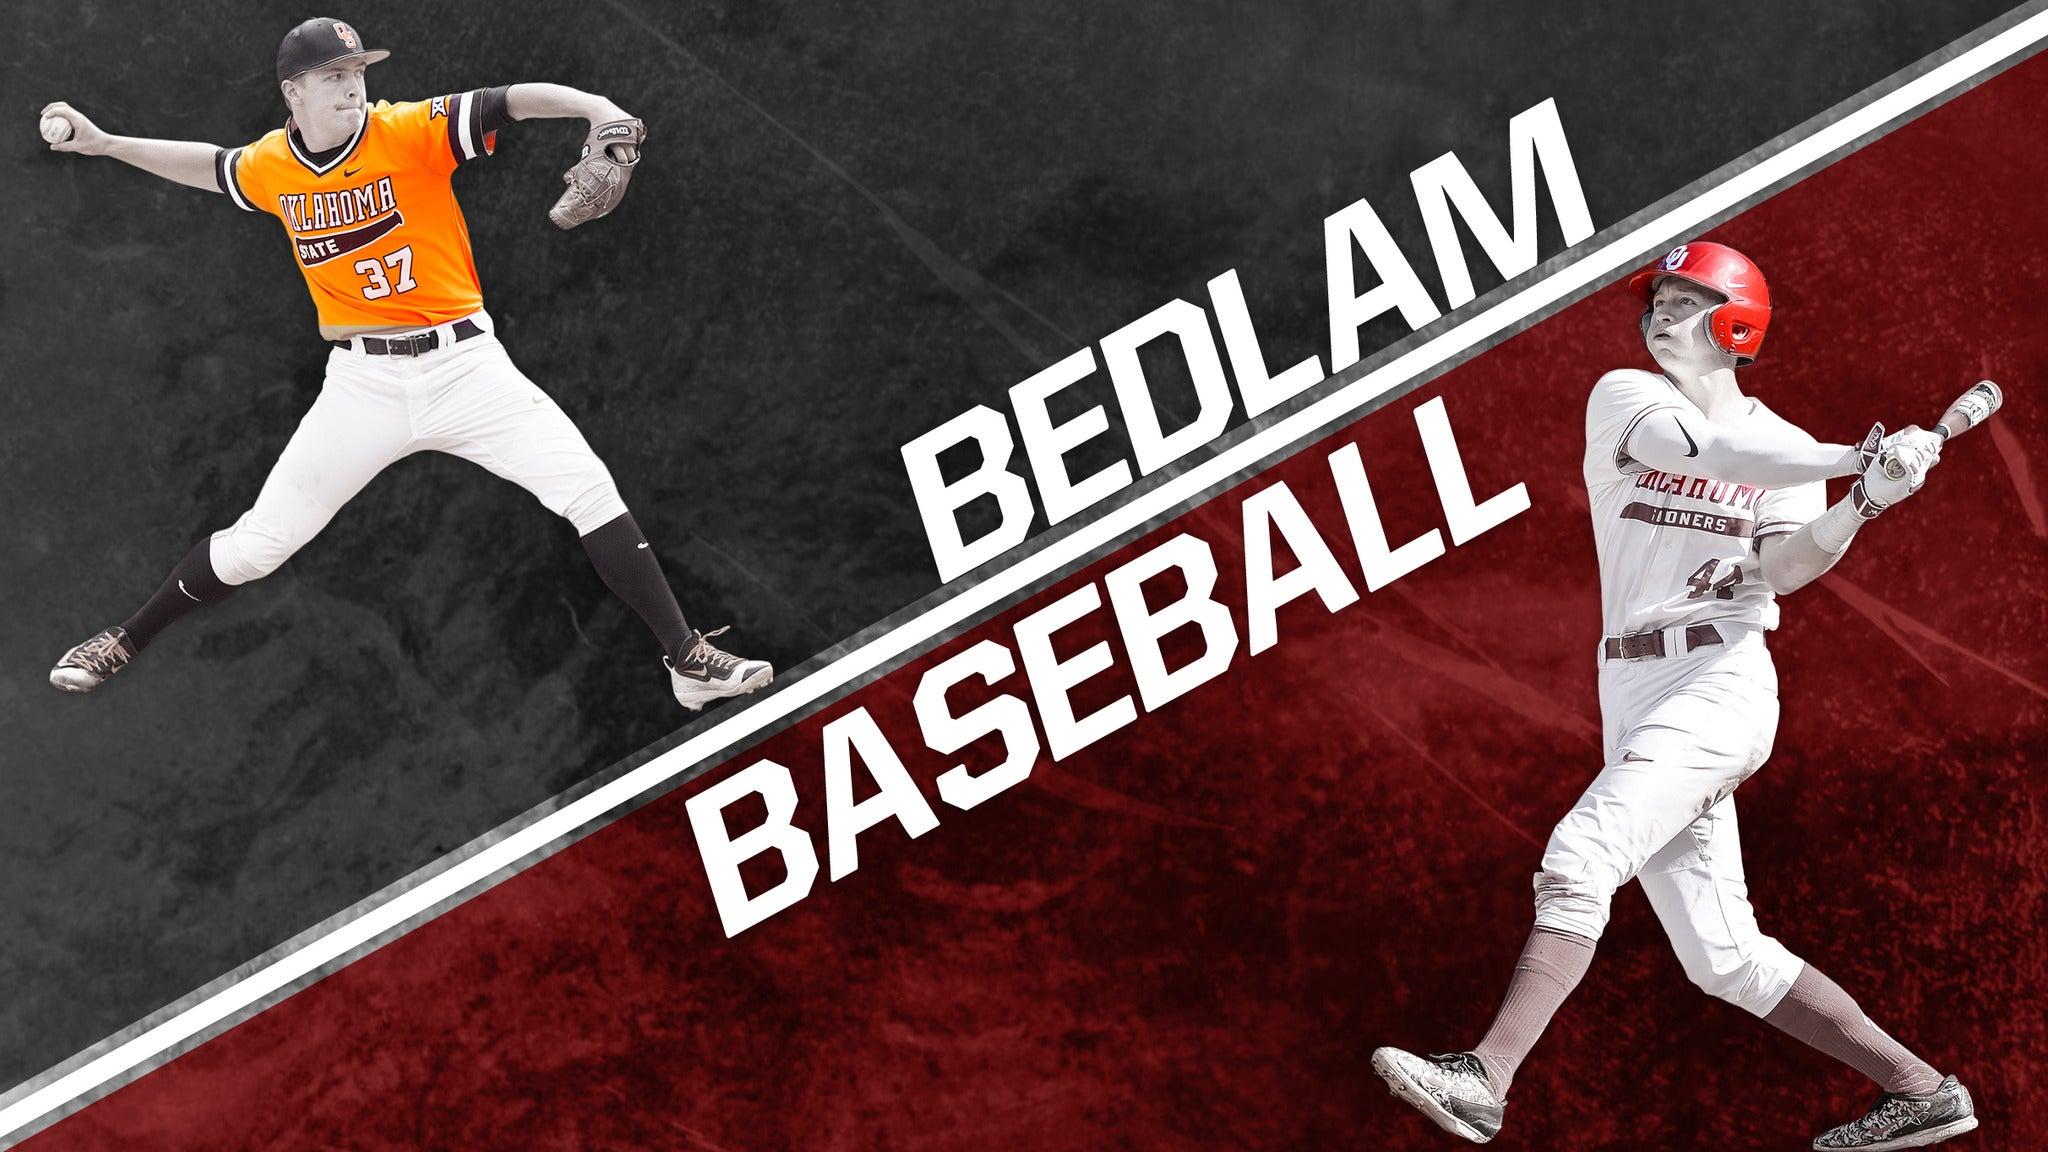 Bedlam Baseball vs. Oklahoma State University Baseball